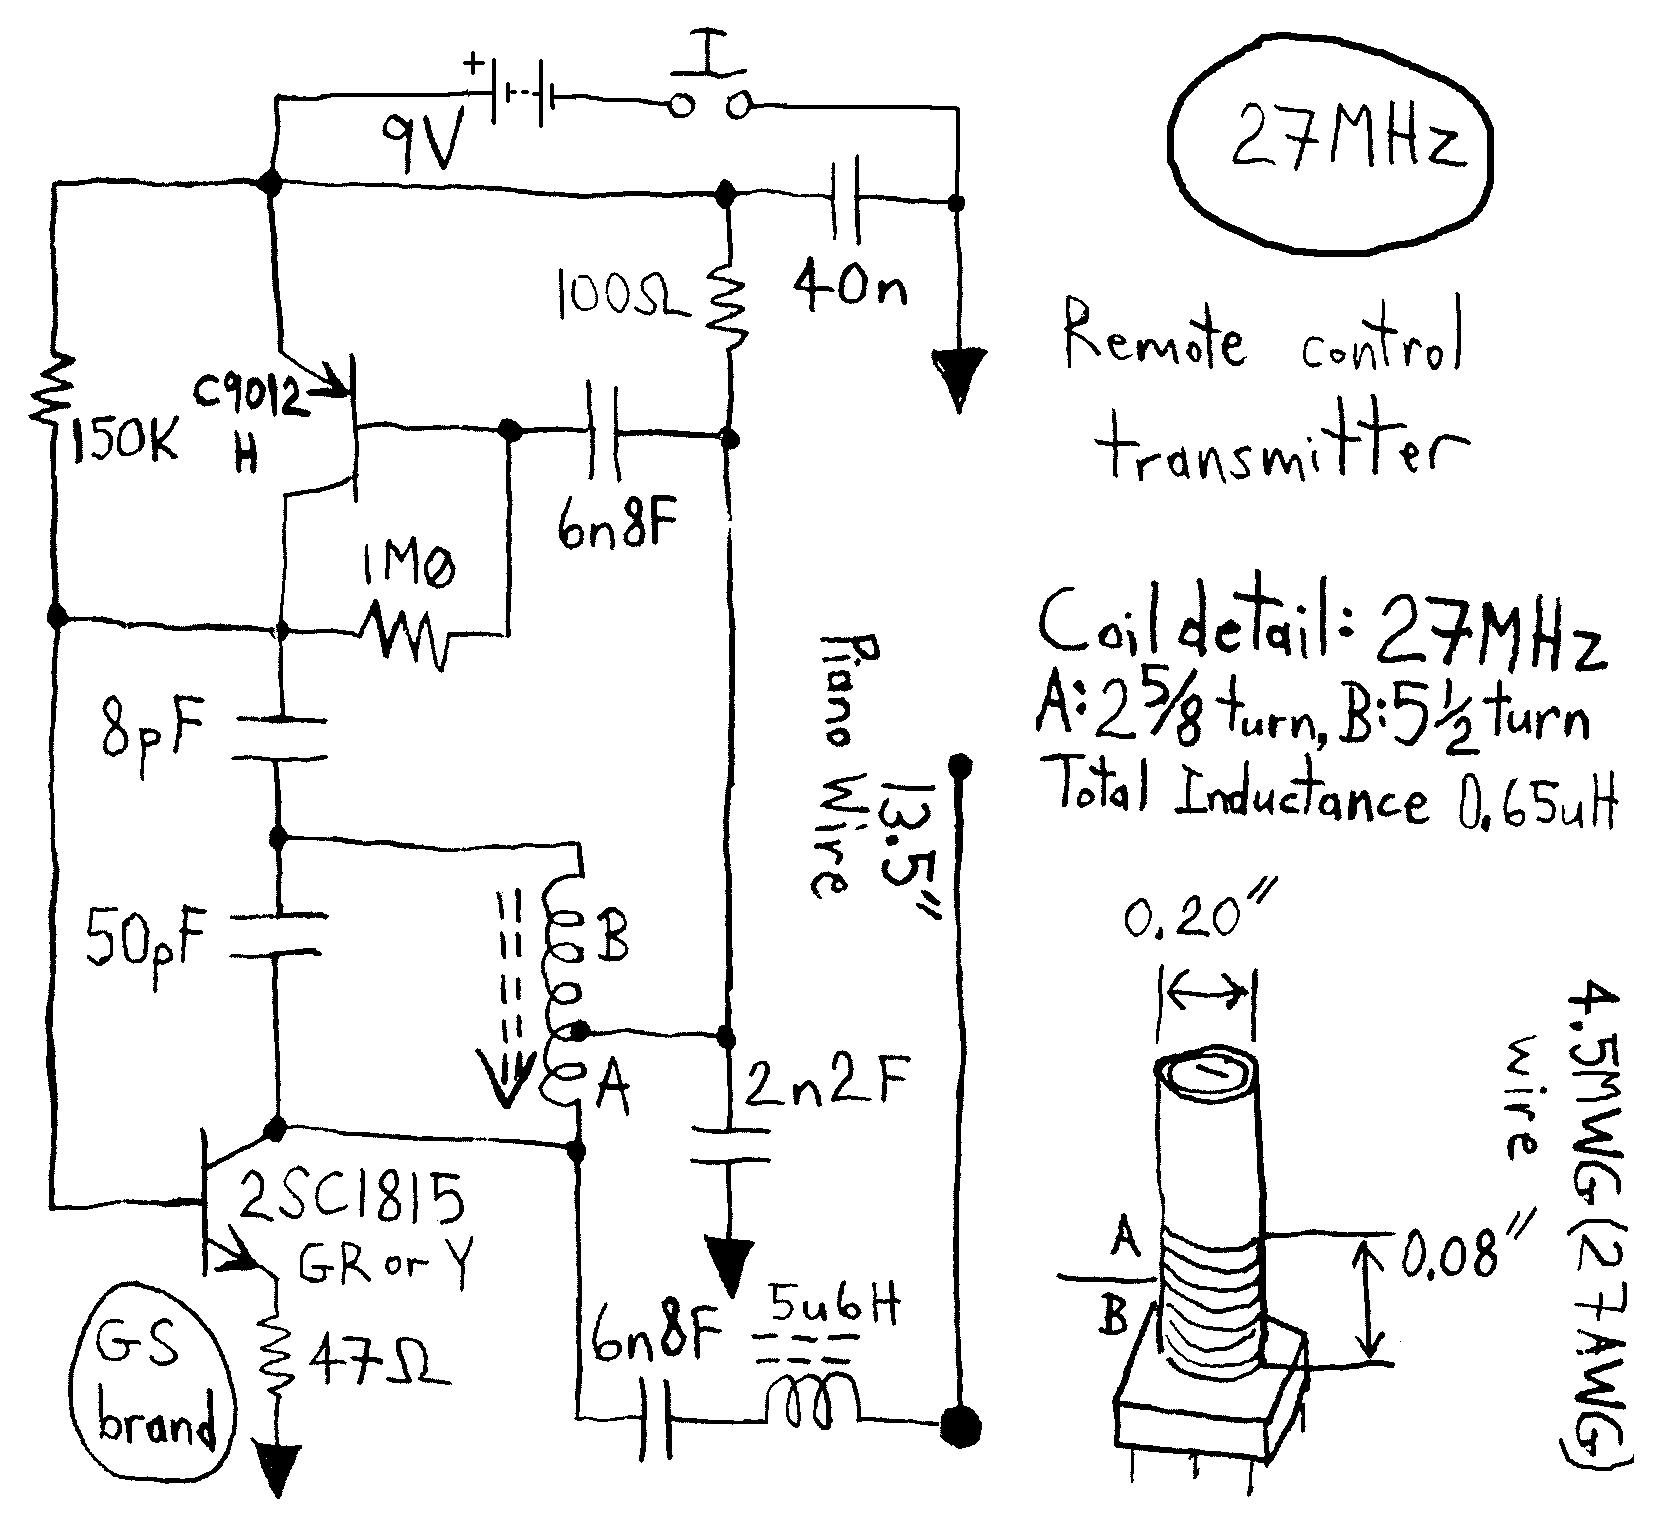 Gt Rf Gt Transmitters Gt Atv Jr Transmitter 440mhz Circuit L